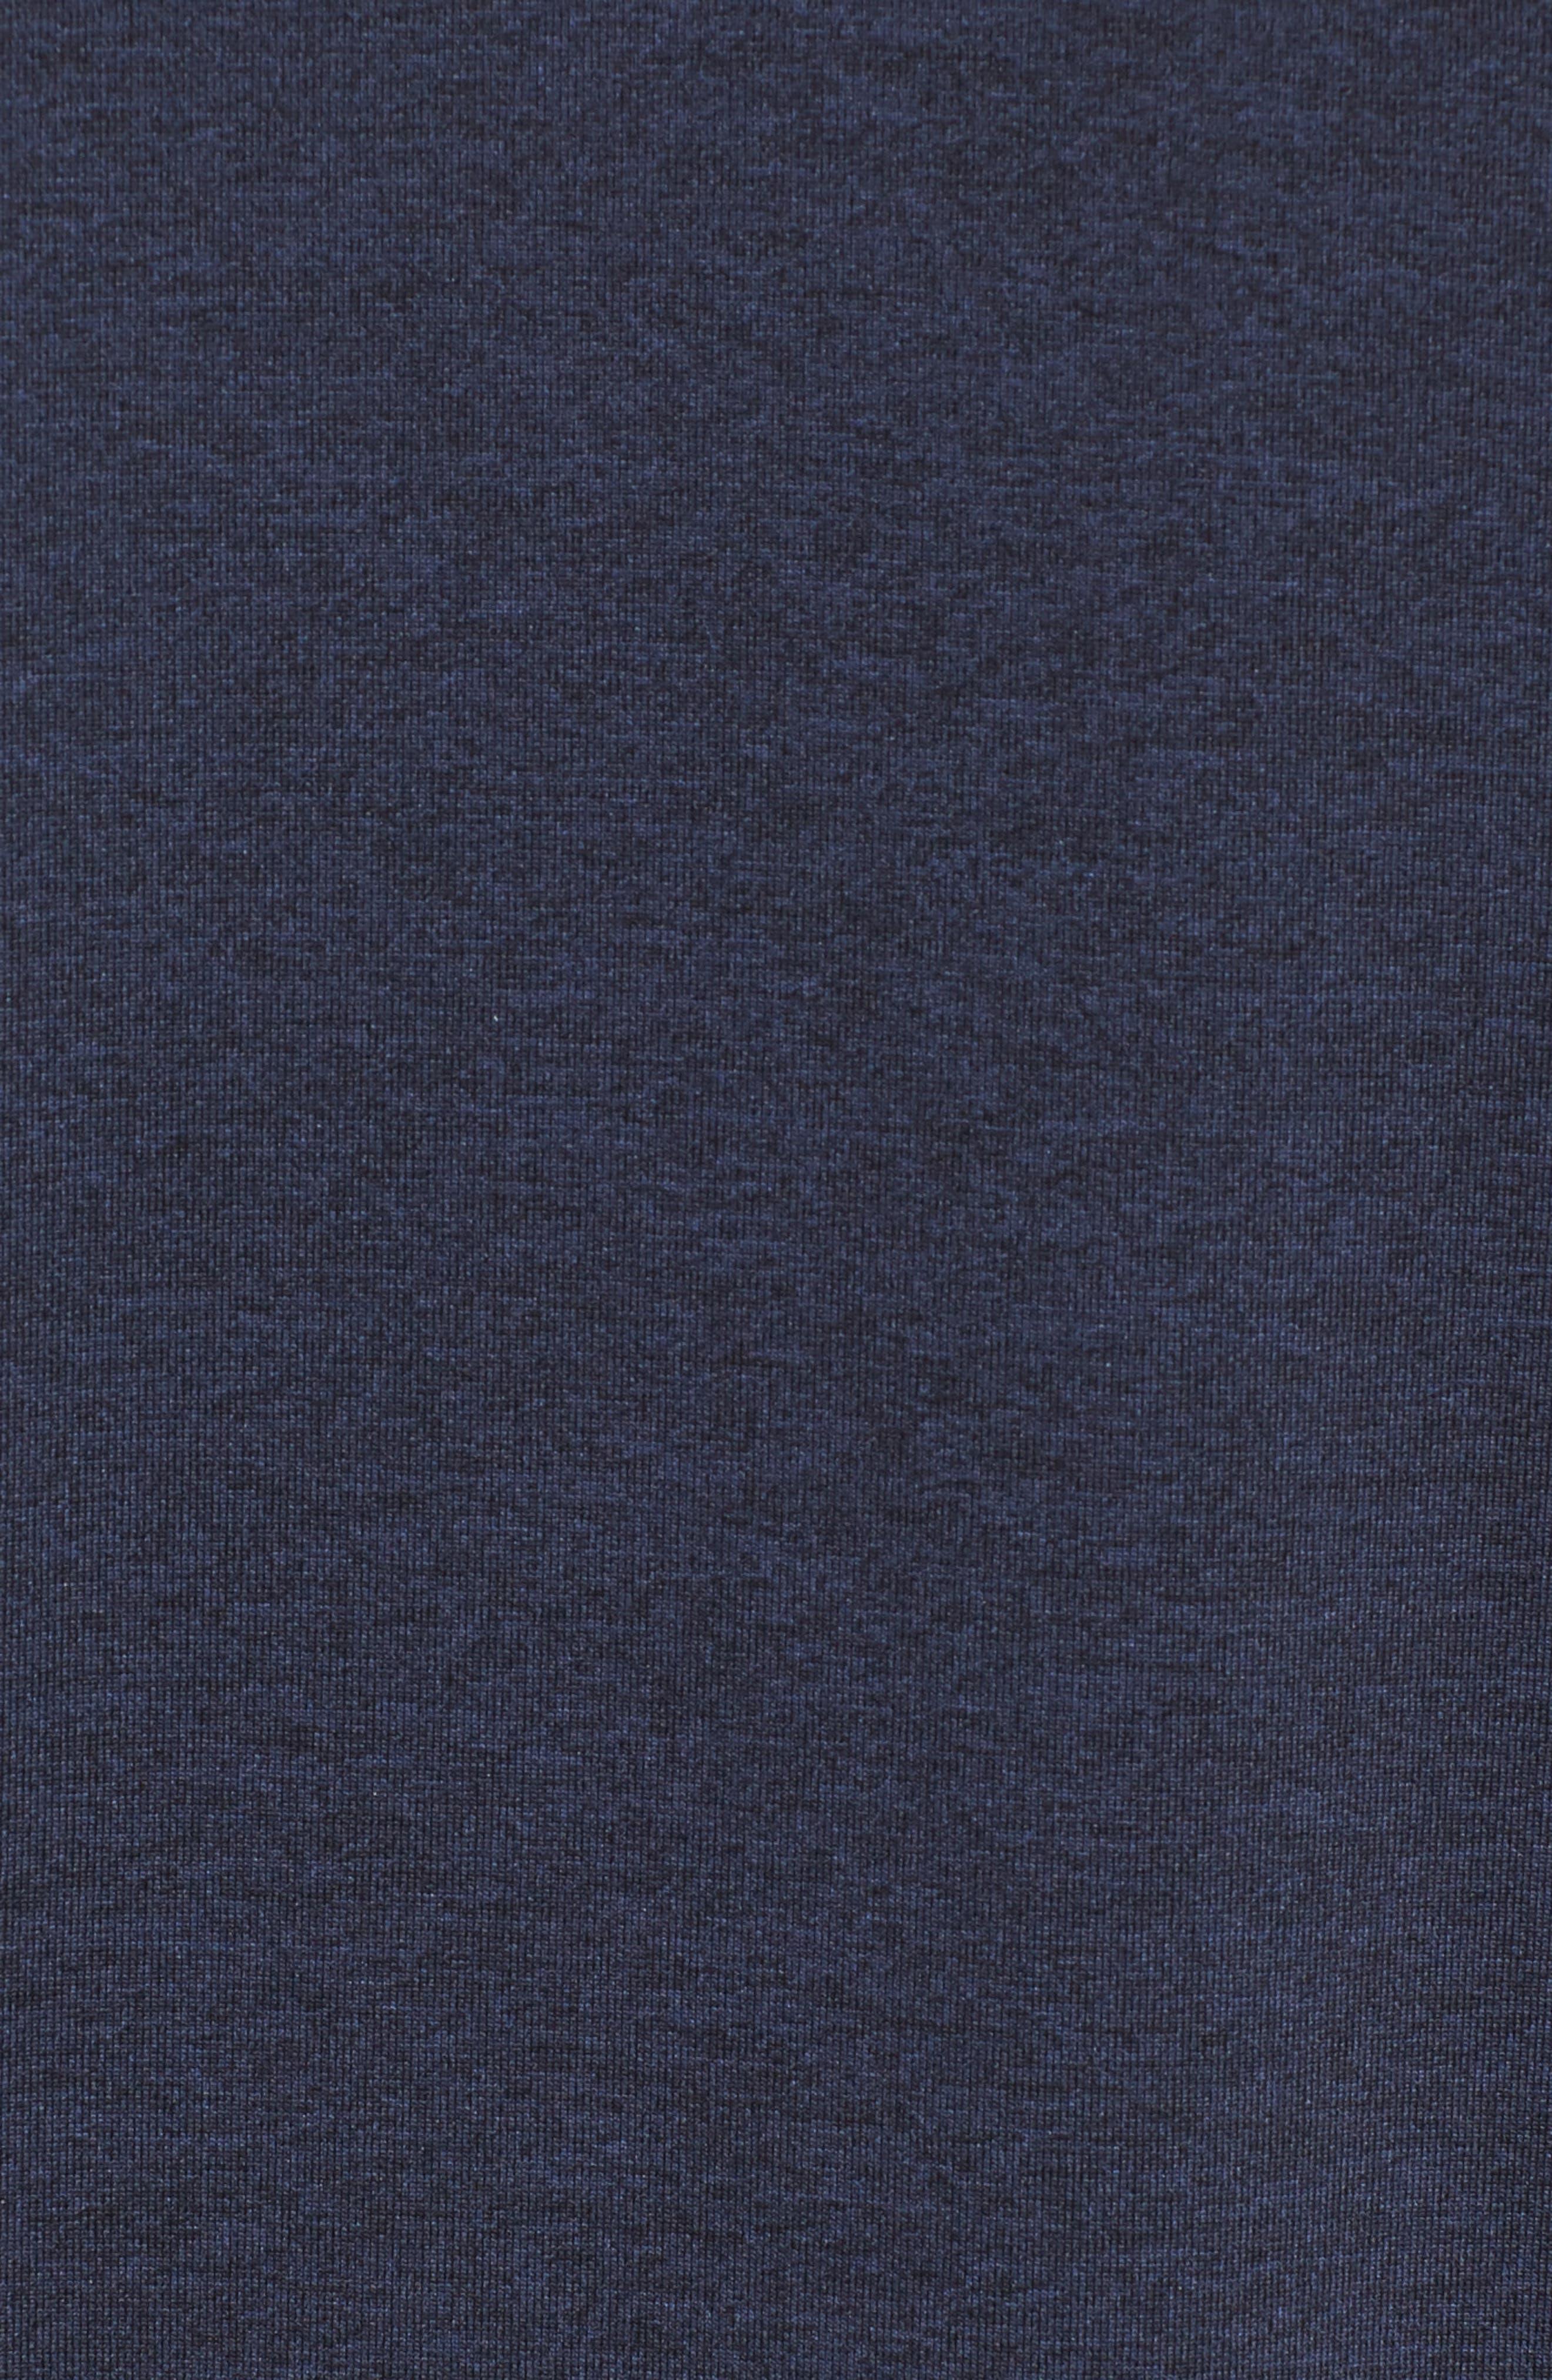 Parway Knit Golf Jacket,                             Alternate thumbnail 5, color,                             410